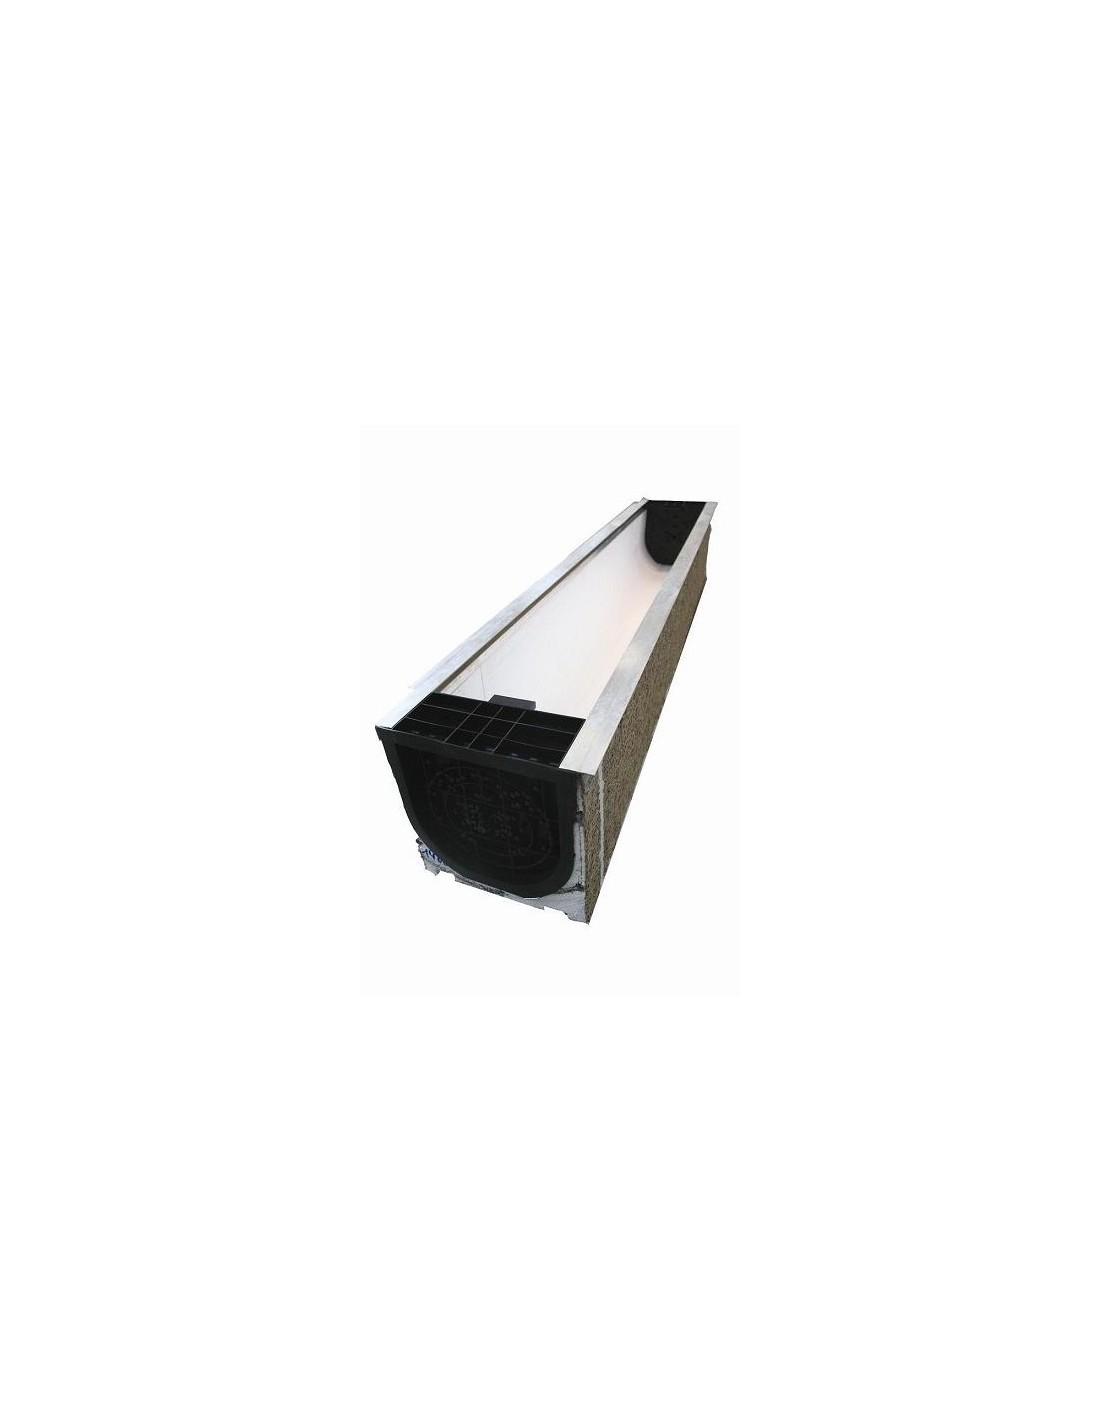 coffre tunnel ma onnerie pour volet roulant t30. Black Bedroom Furniture Sets. Home Design Ideas